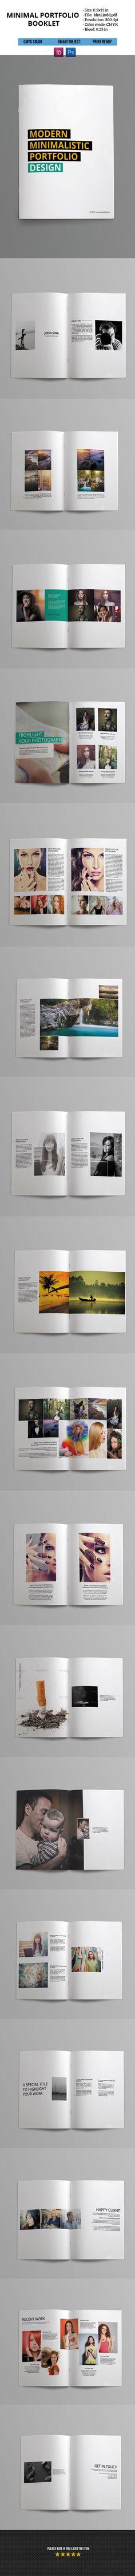 Minimal Portfolio Booklet on Behance Booklet Template, Booklet Design, Brochure Design, Brochure Template, Portfolio Booklet, Portfolio Layout, Portfolio Design, Media Design, Ad Design